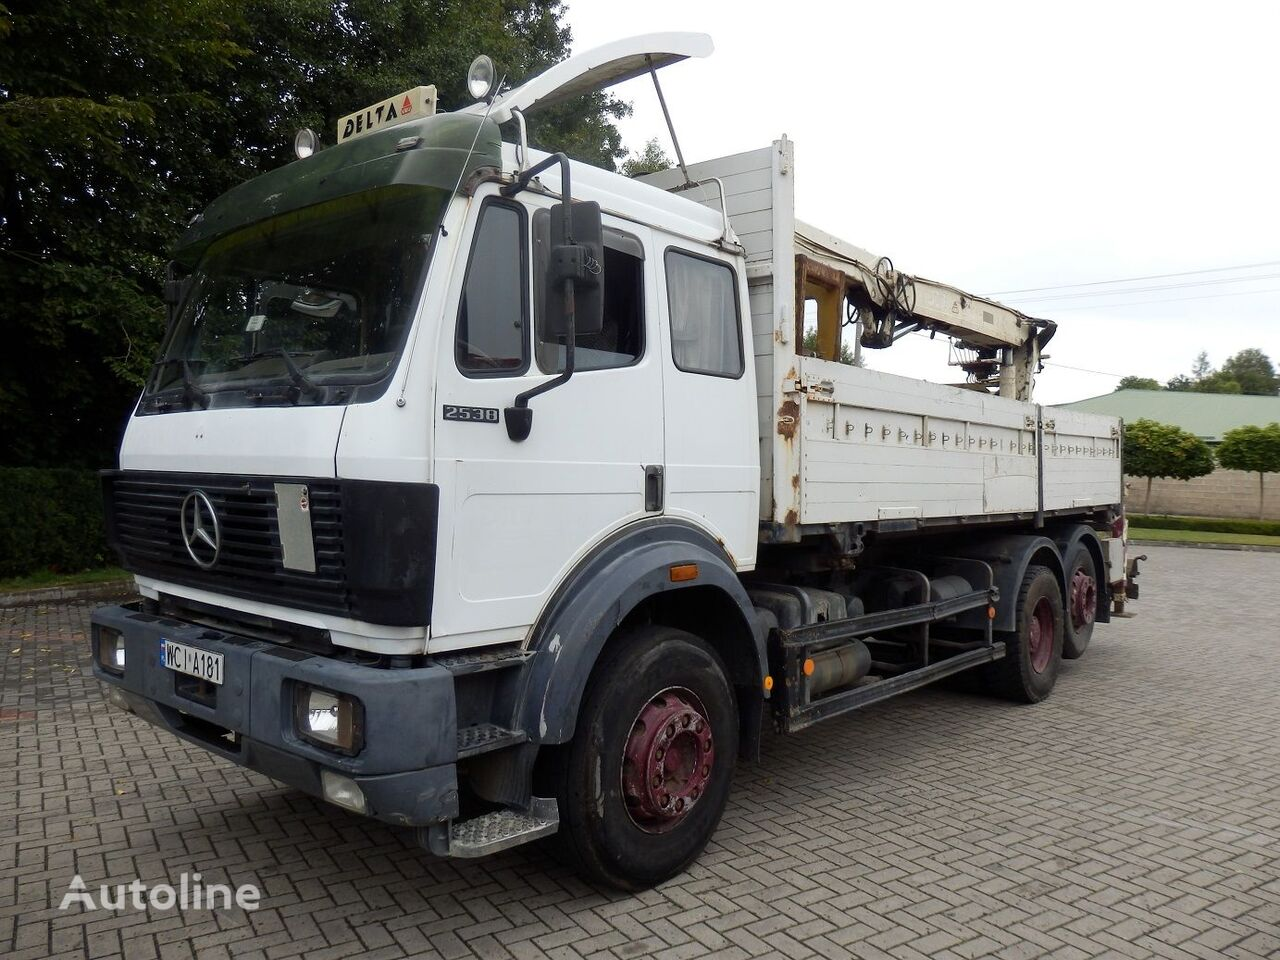 camion plateau ridelles MERCEDES-BENZ SK 2538 6x2 Engine V8 13.t Axles